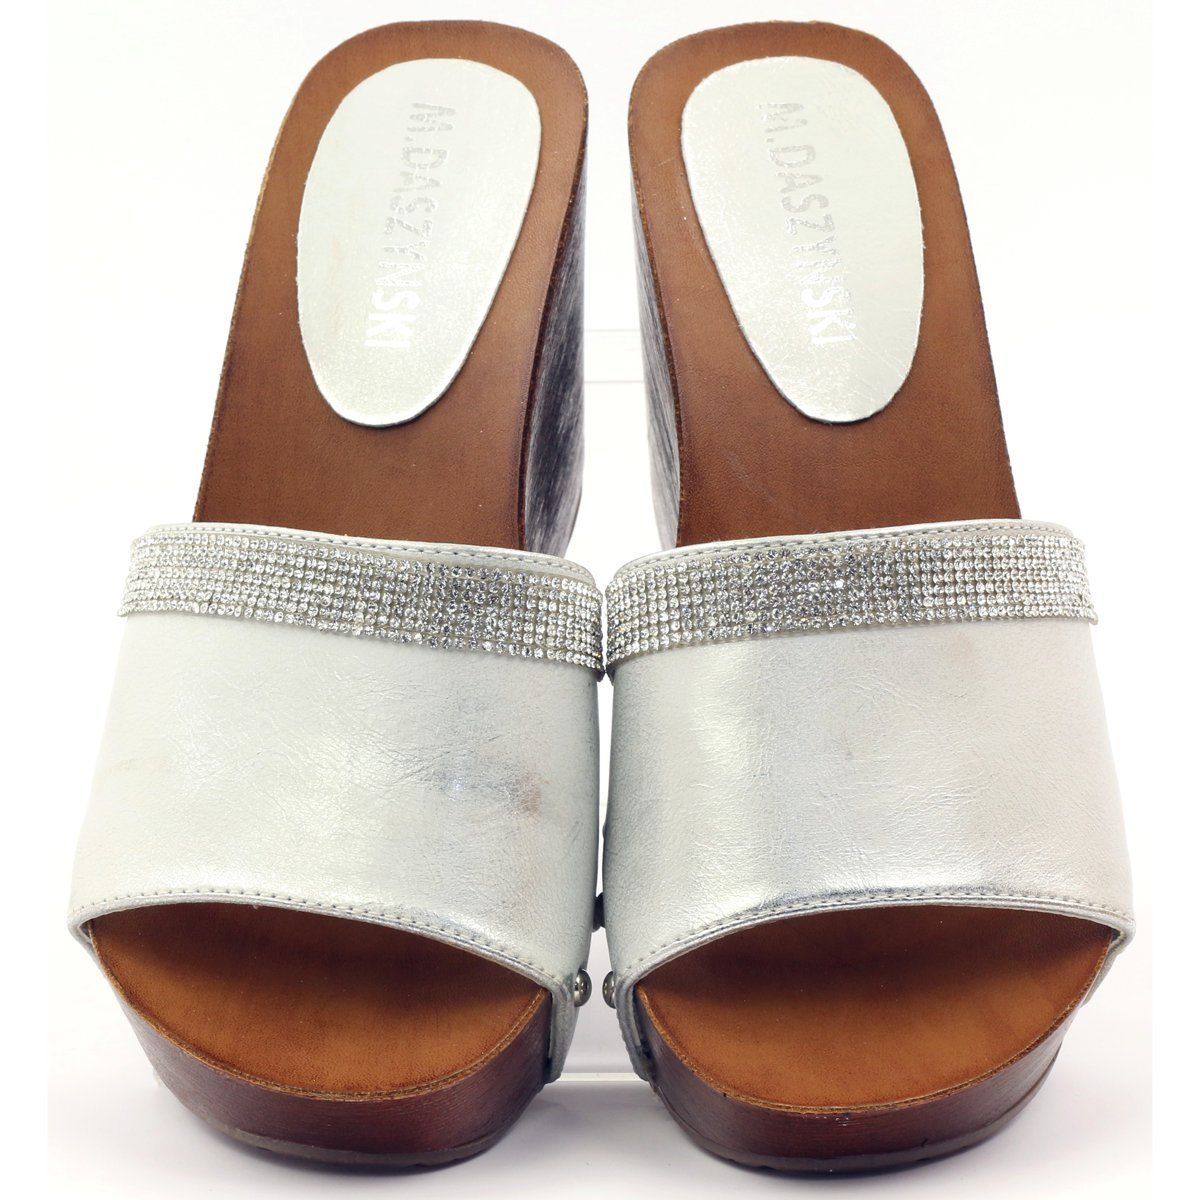 Klapki Na Koturnie Daszynski Z Cyrkoniami Szare Slip On Sandal Sandals Shoes